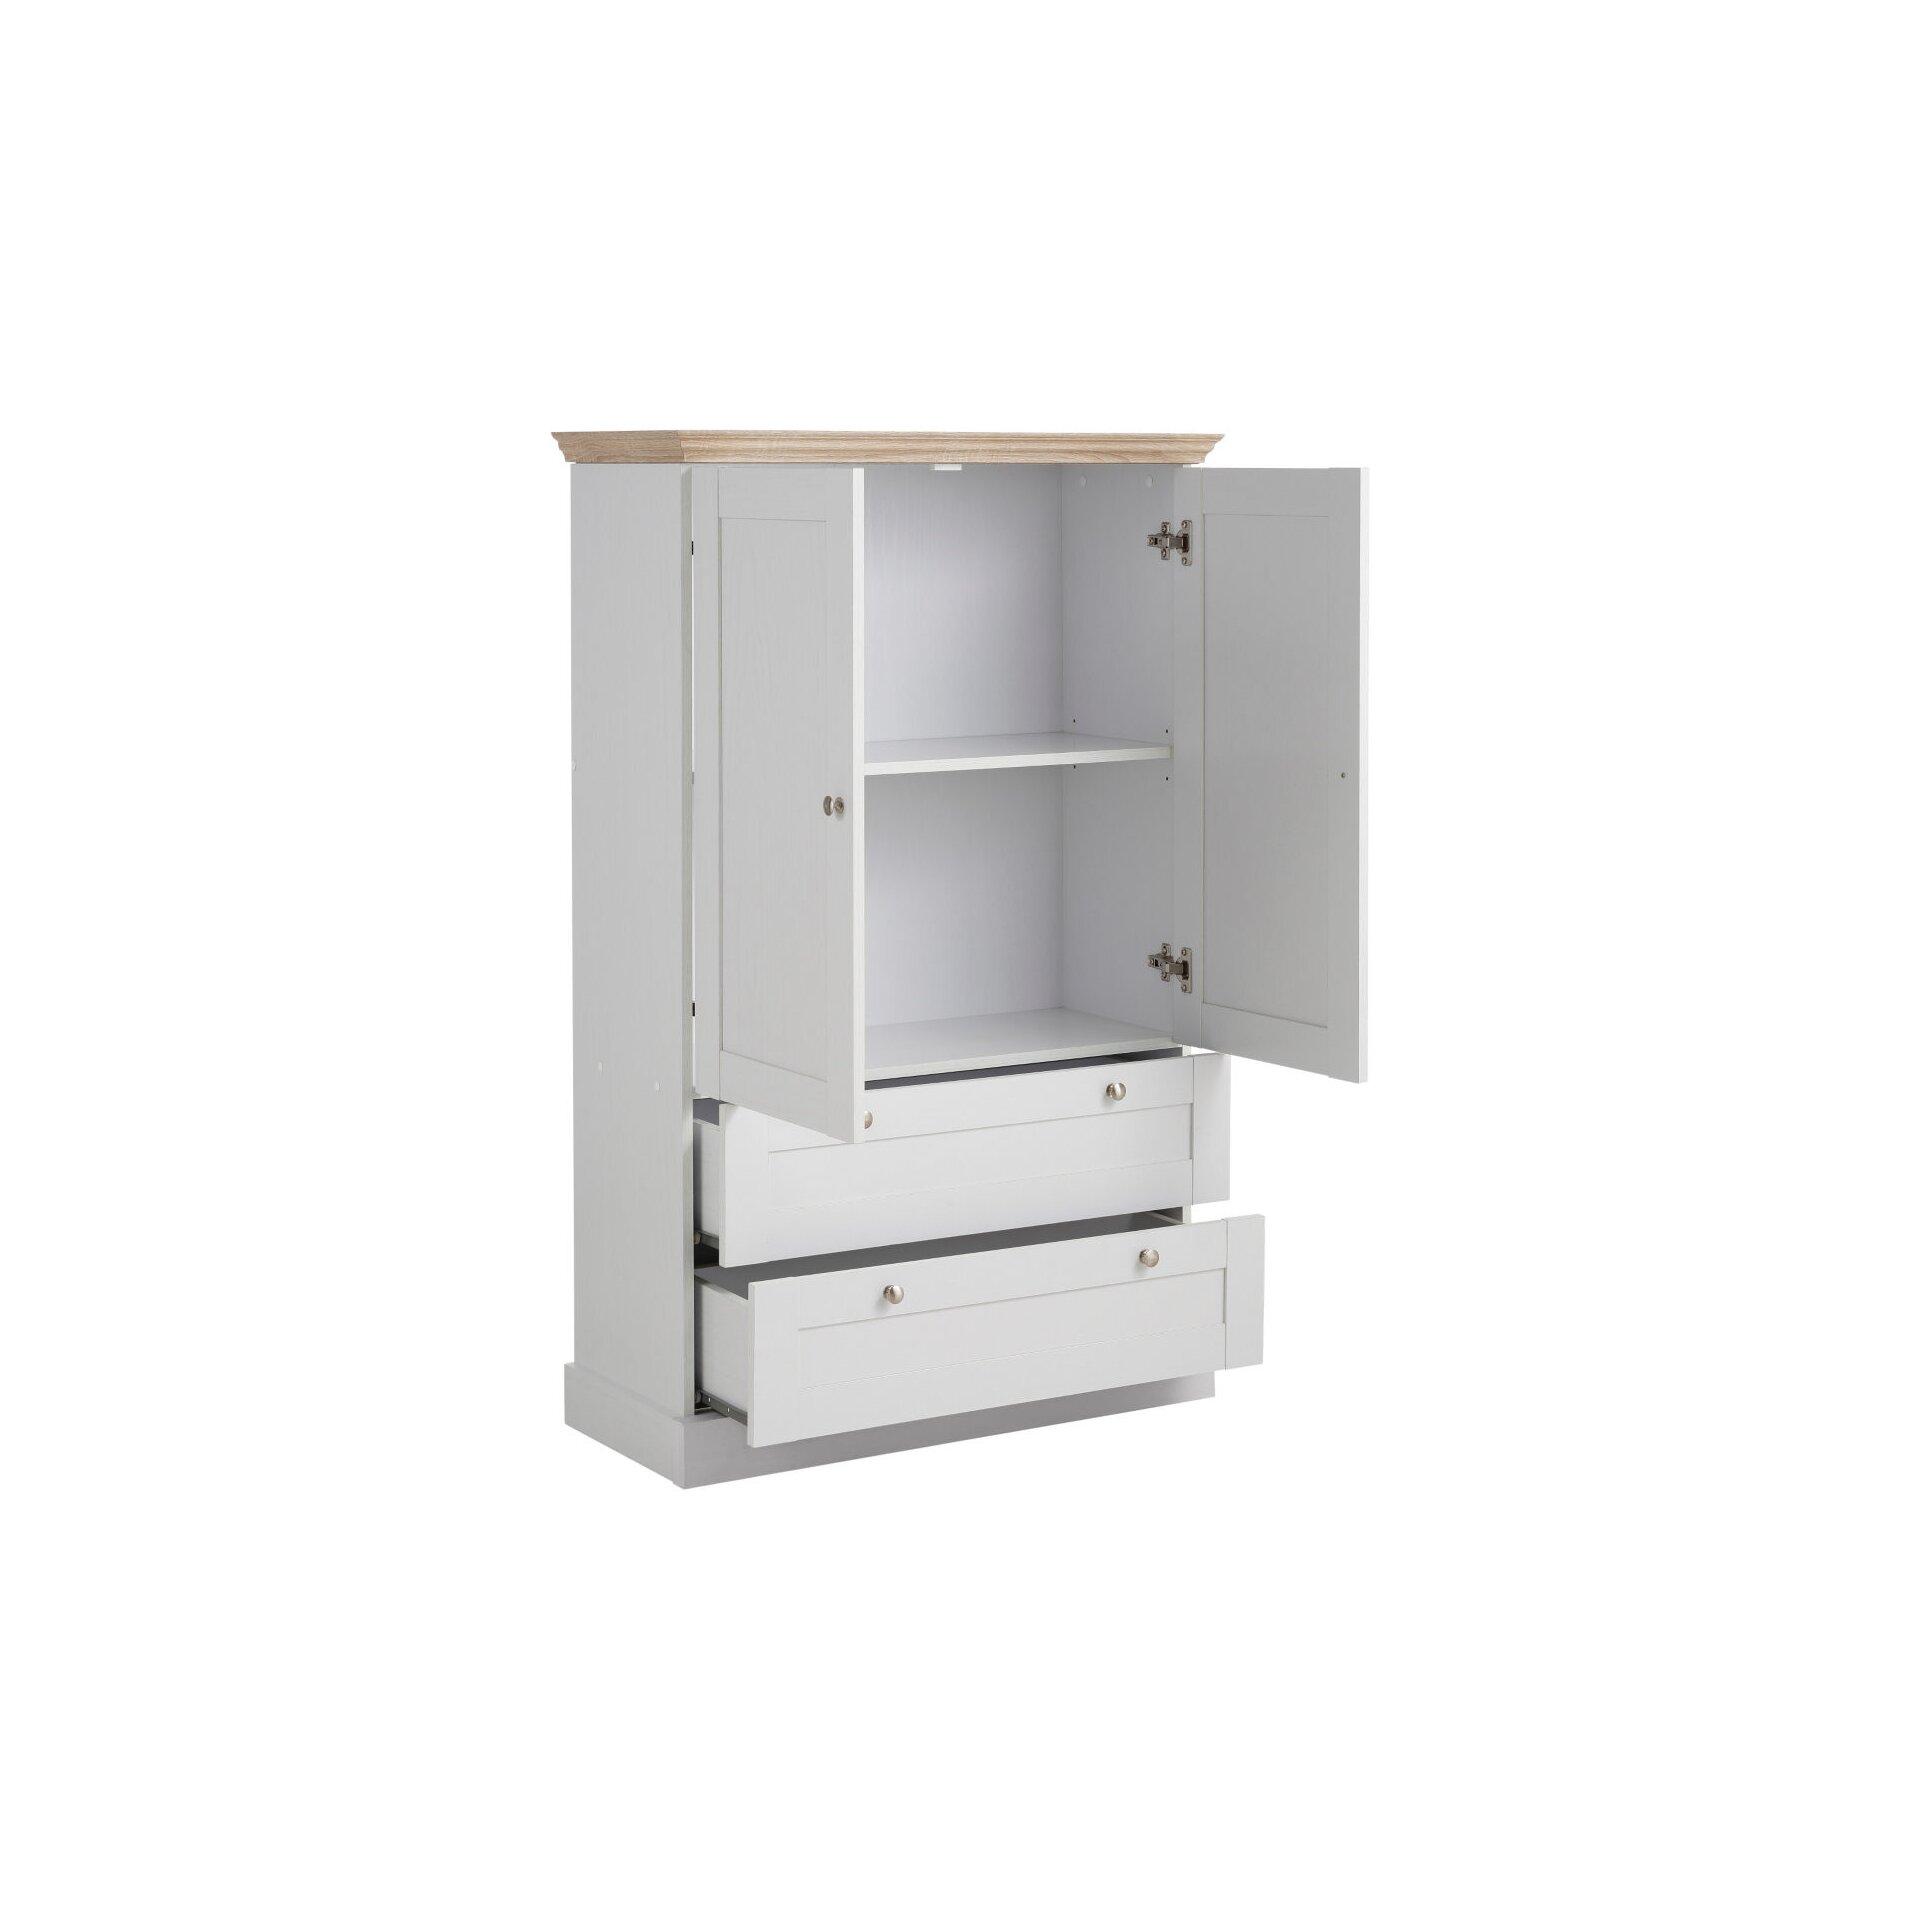 Hokku Designs Hokku Designs Bruce Laundry Cabinet Reviews Wayfaircouk